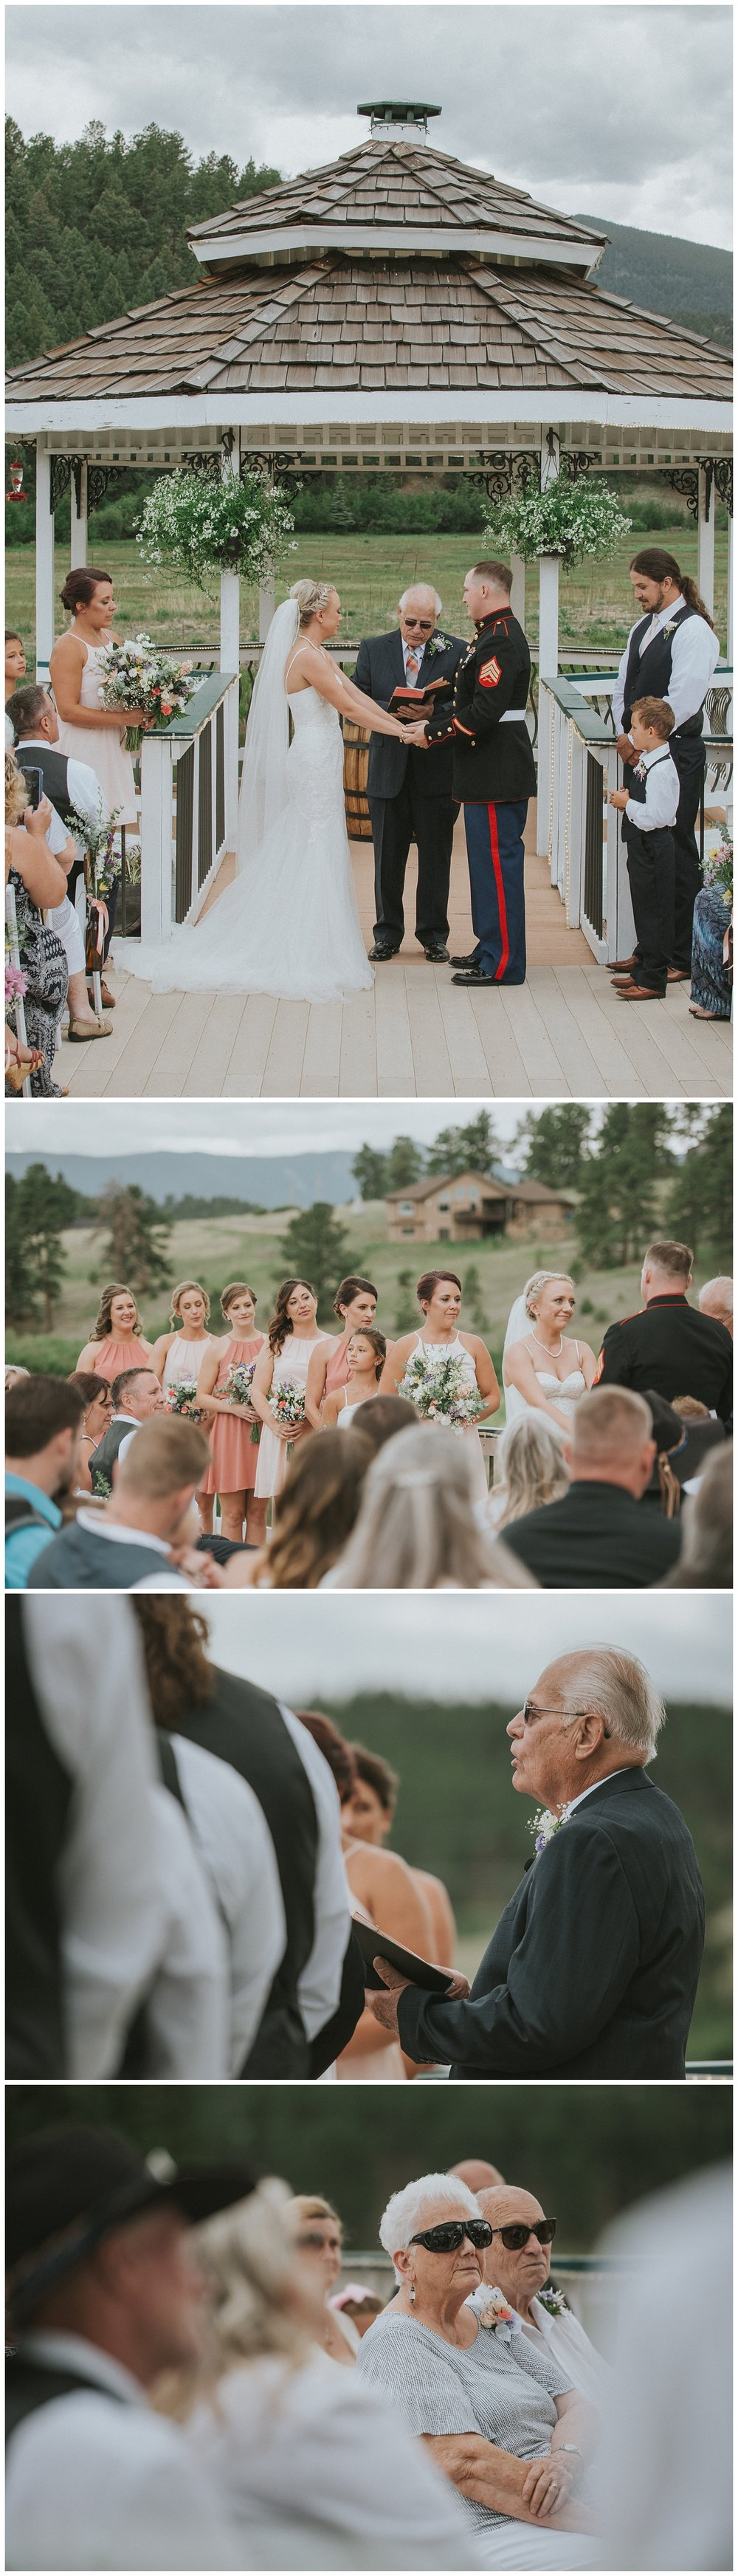 deer-creek-valley-ranch-wedding-photos_0065.jpg